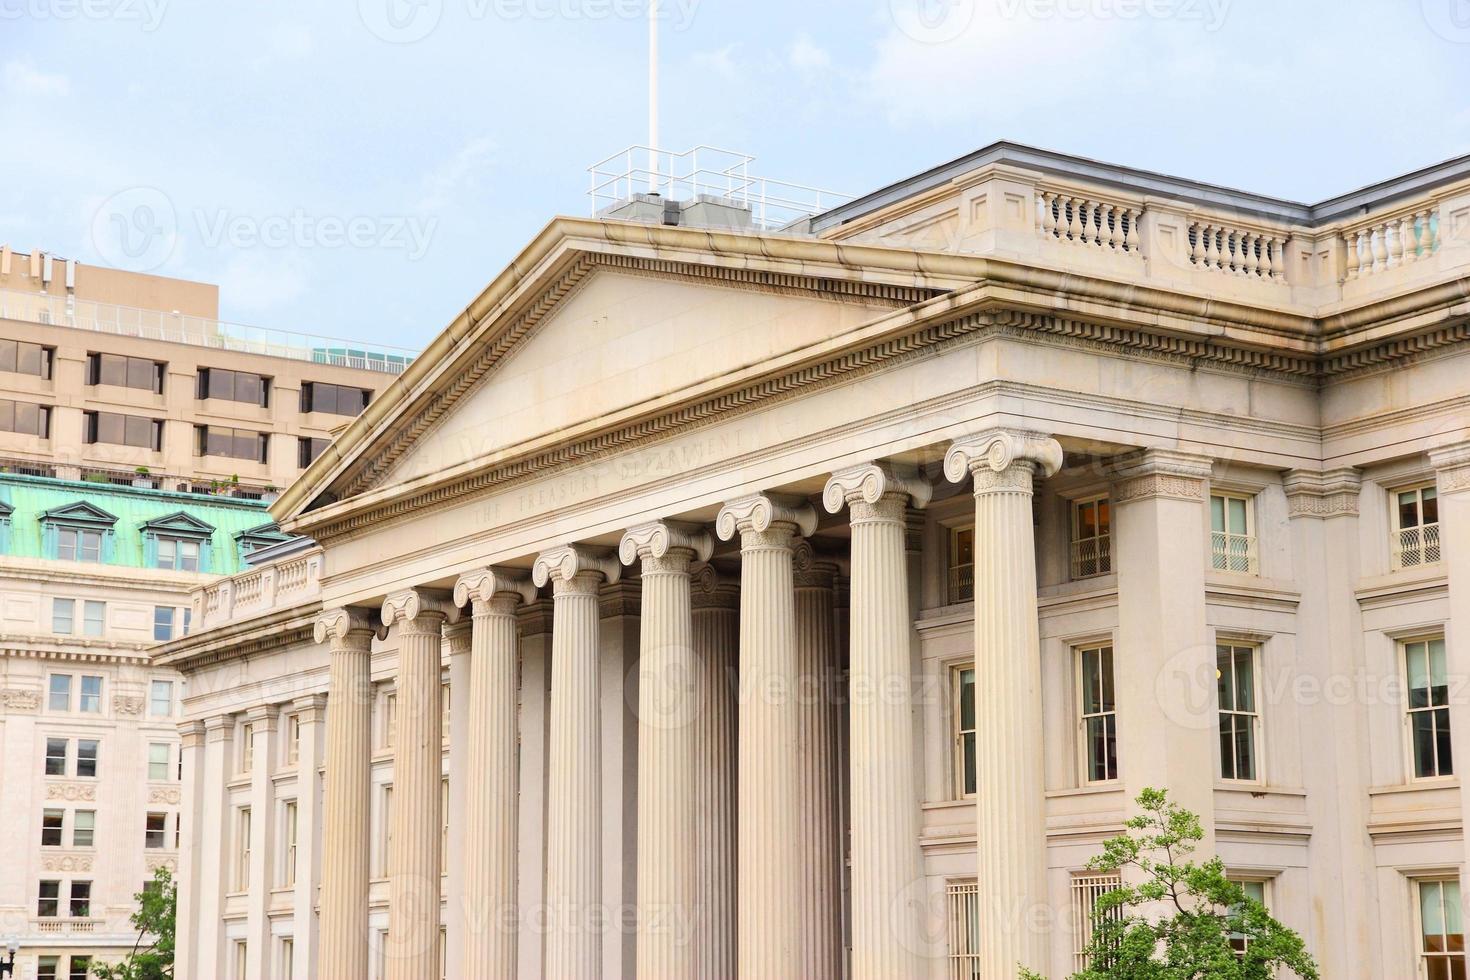 Treasury Department photo